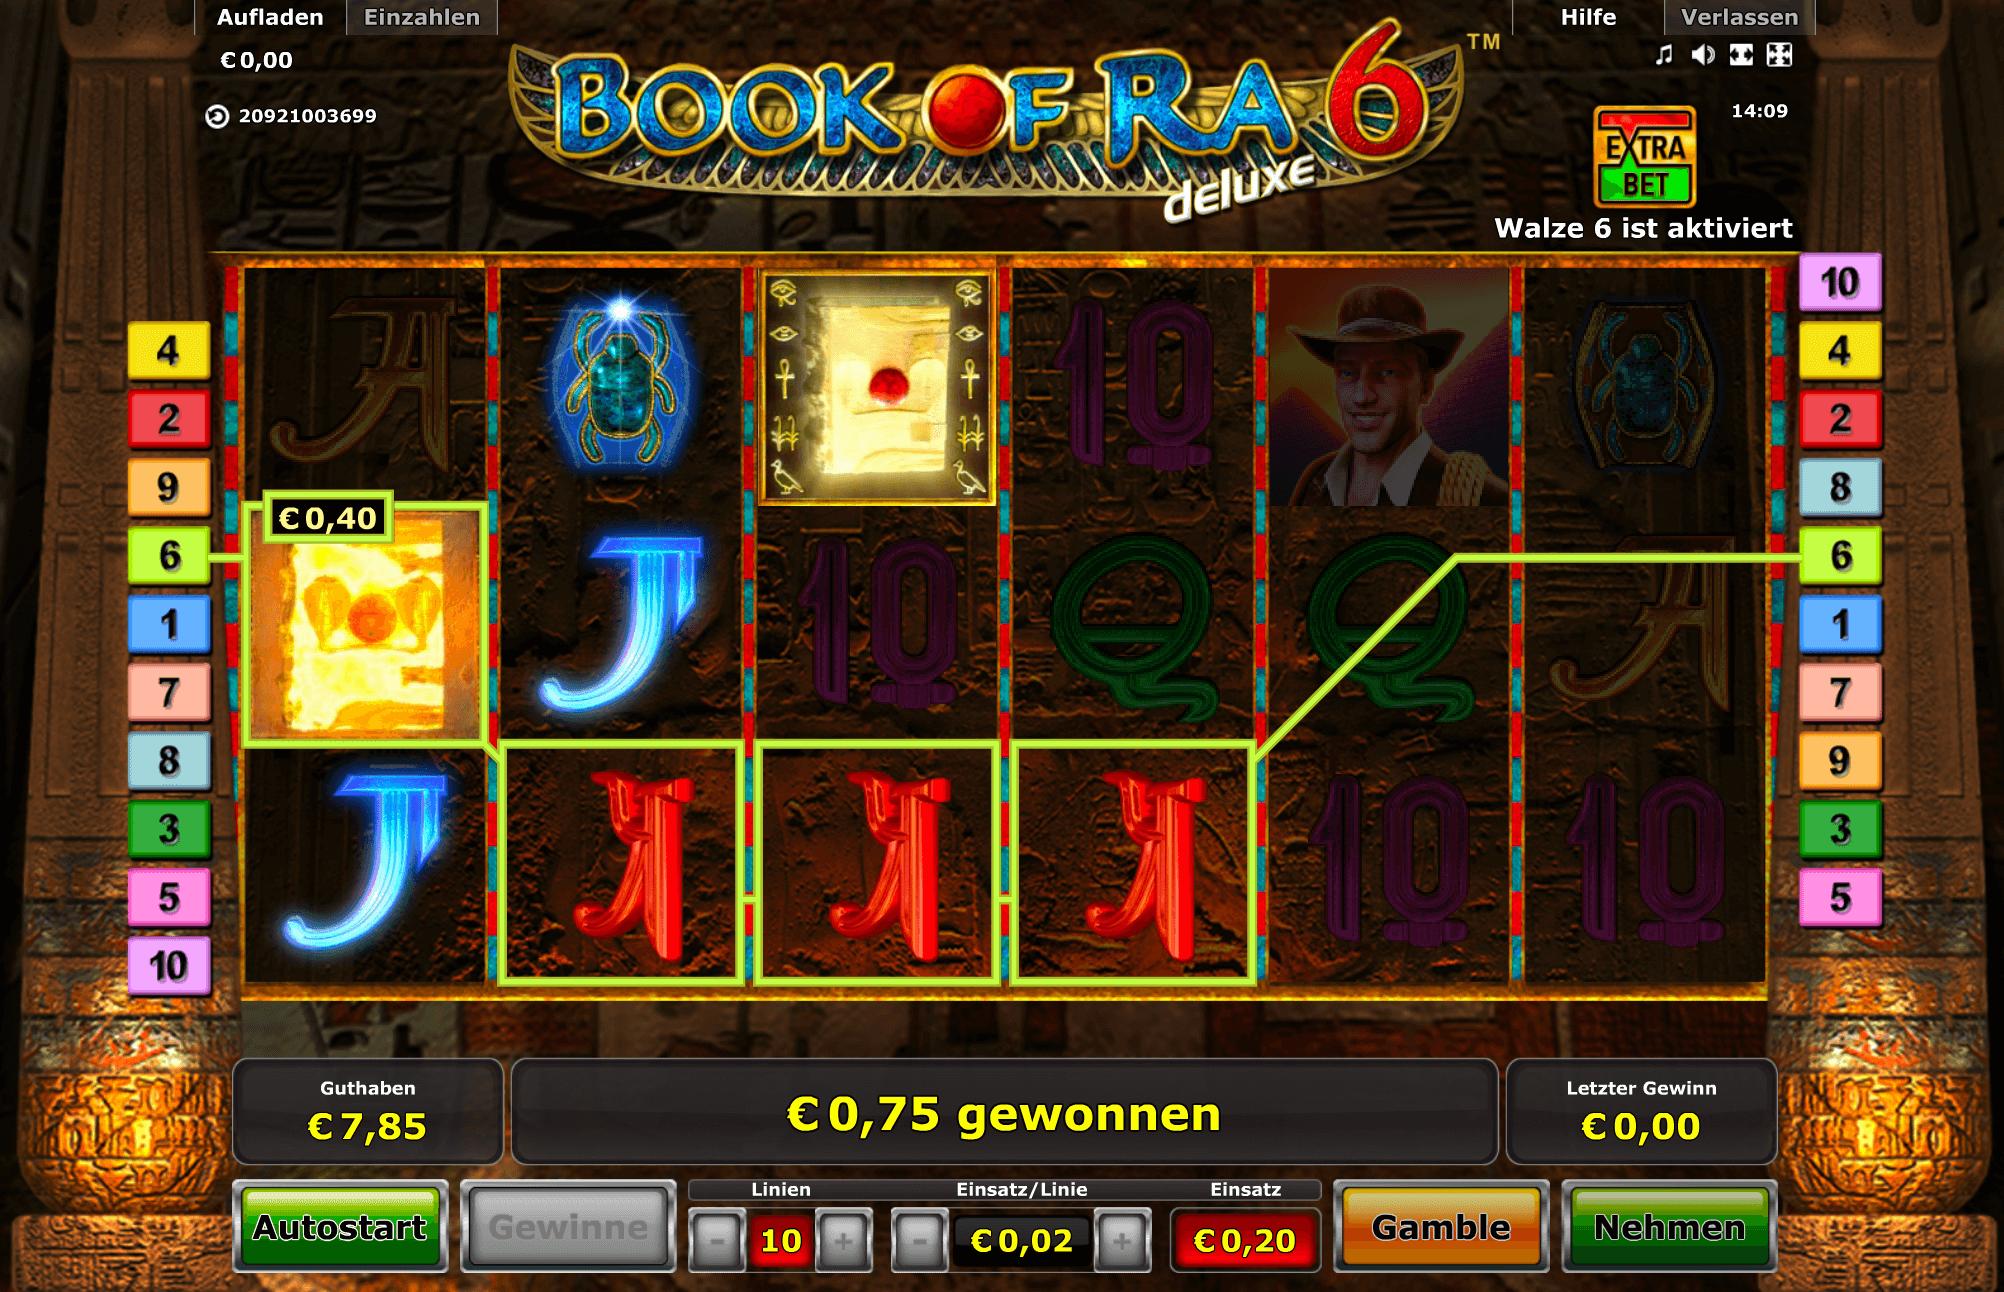 Book of Ra online spielen & 250€ Bonus geschenkt oder